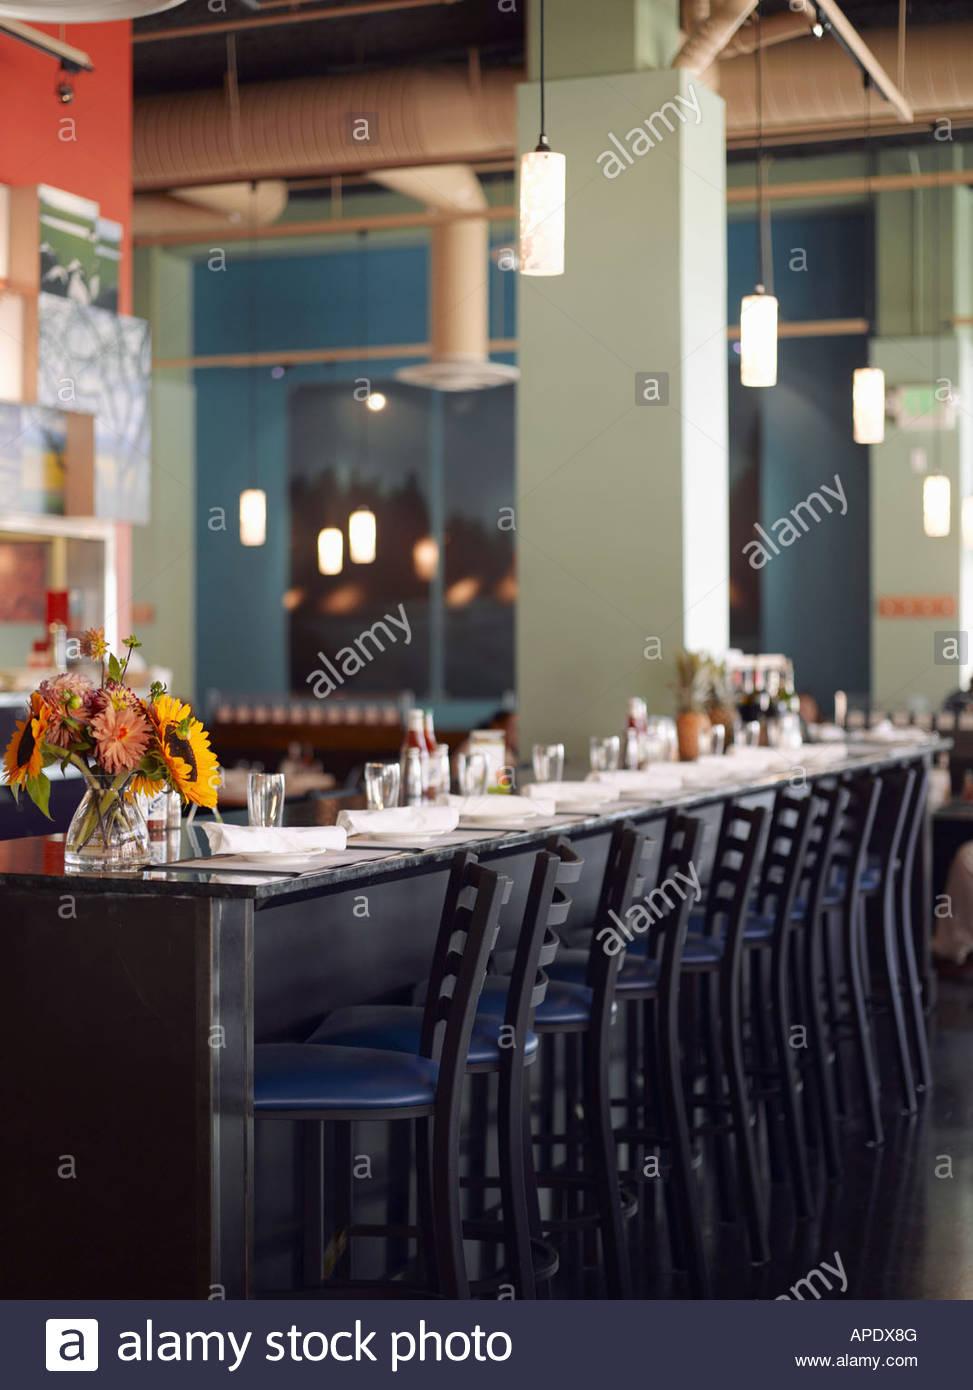 Place settings and stools at bar - Stock Image